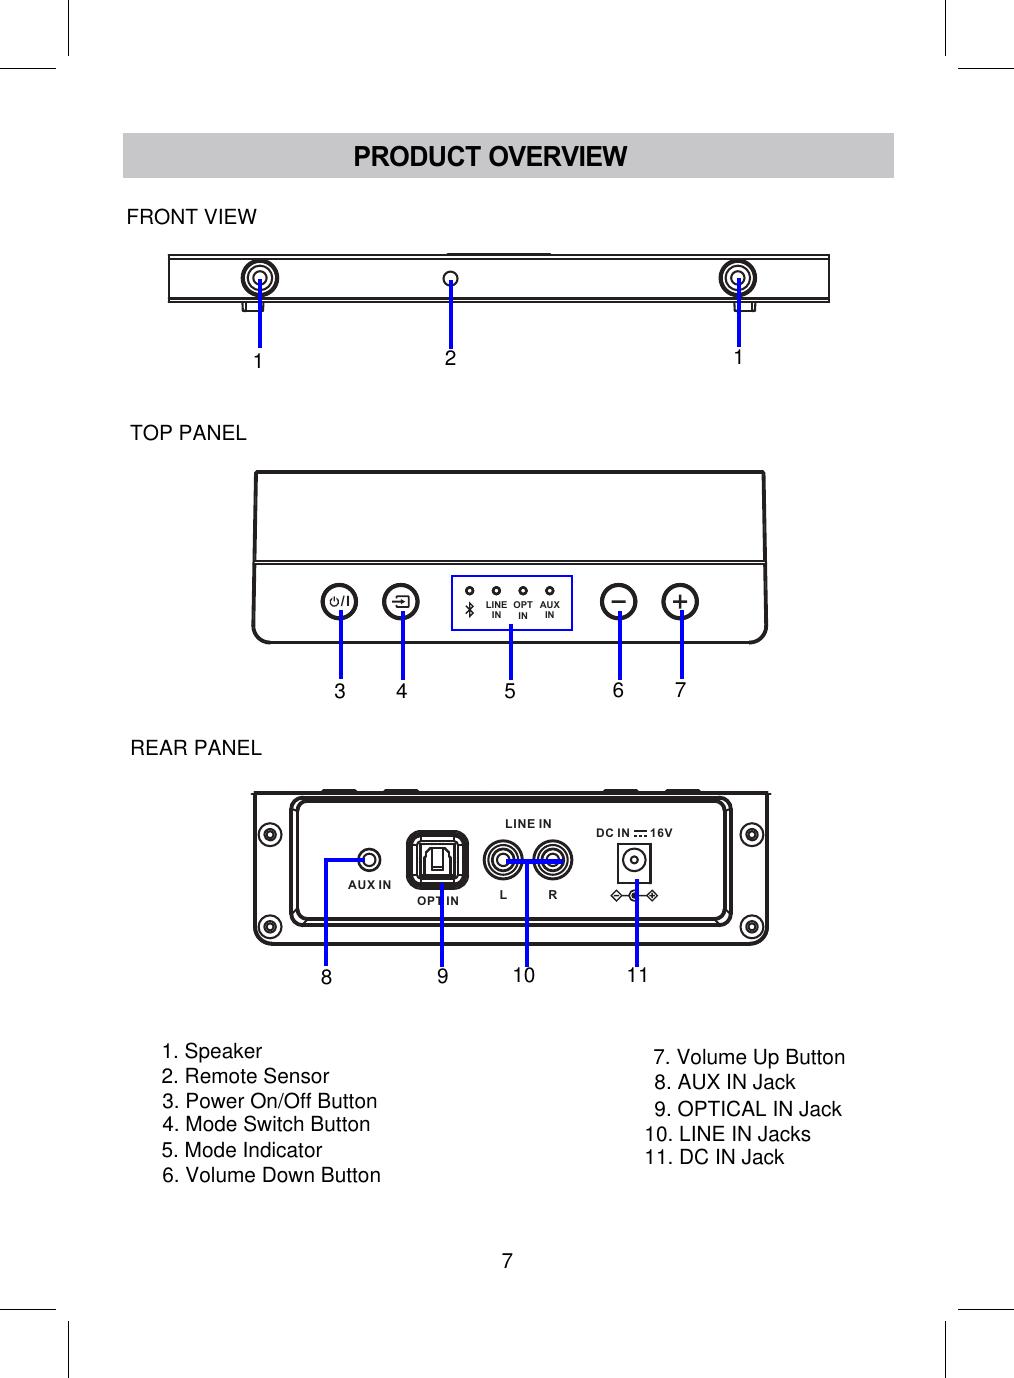 Junlan Electronic ONB18SB ONN 37in BLUETOOTH SOUNDBAR User